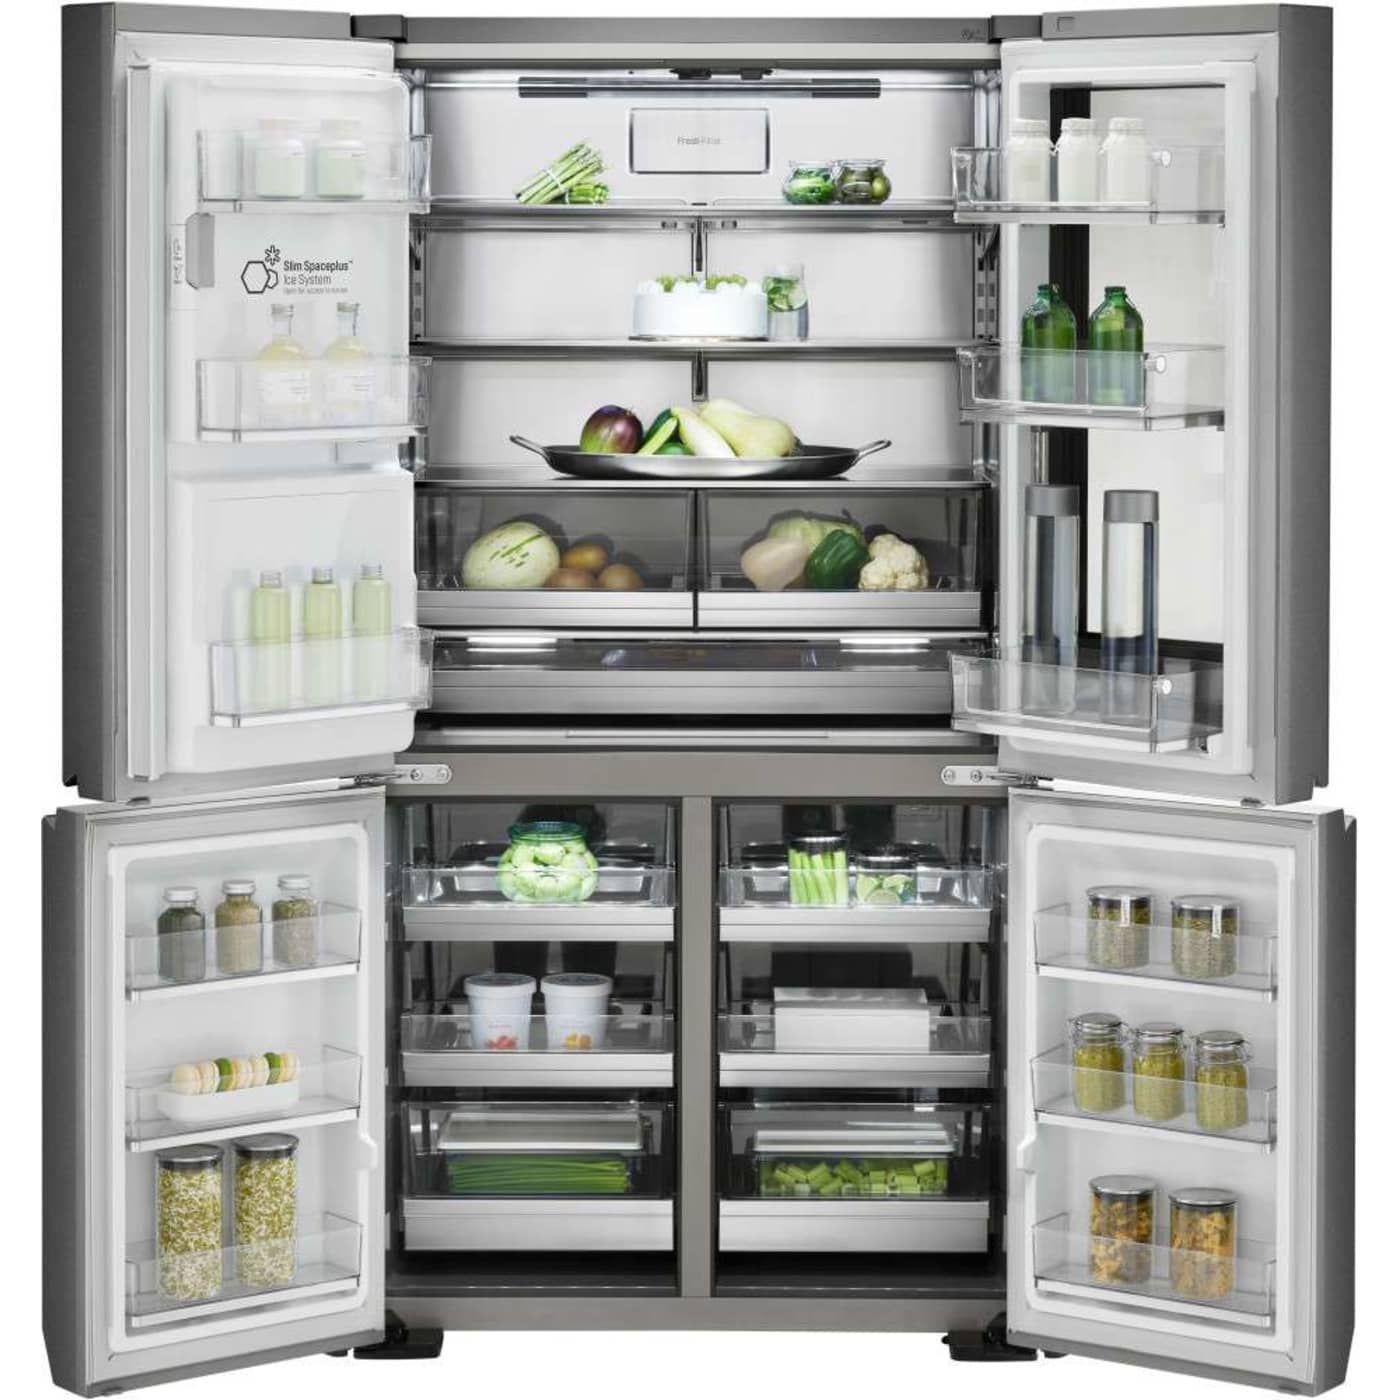 16+ Lg craft ice fridge best buy info